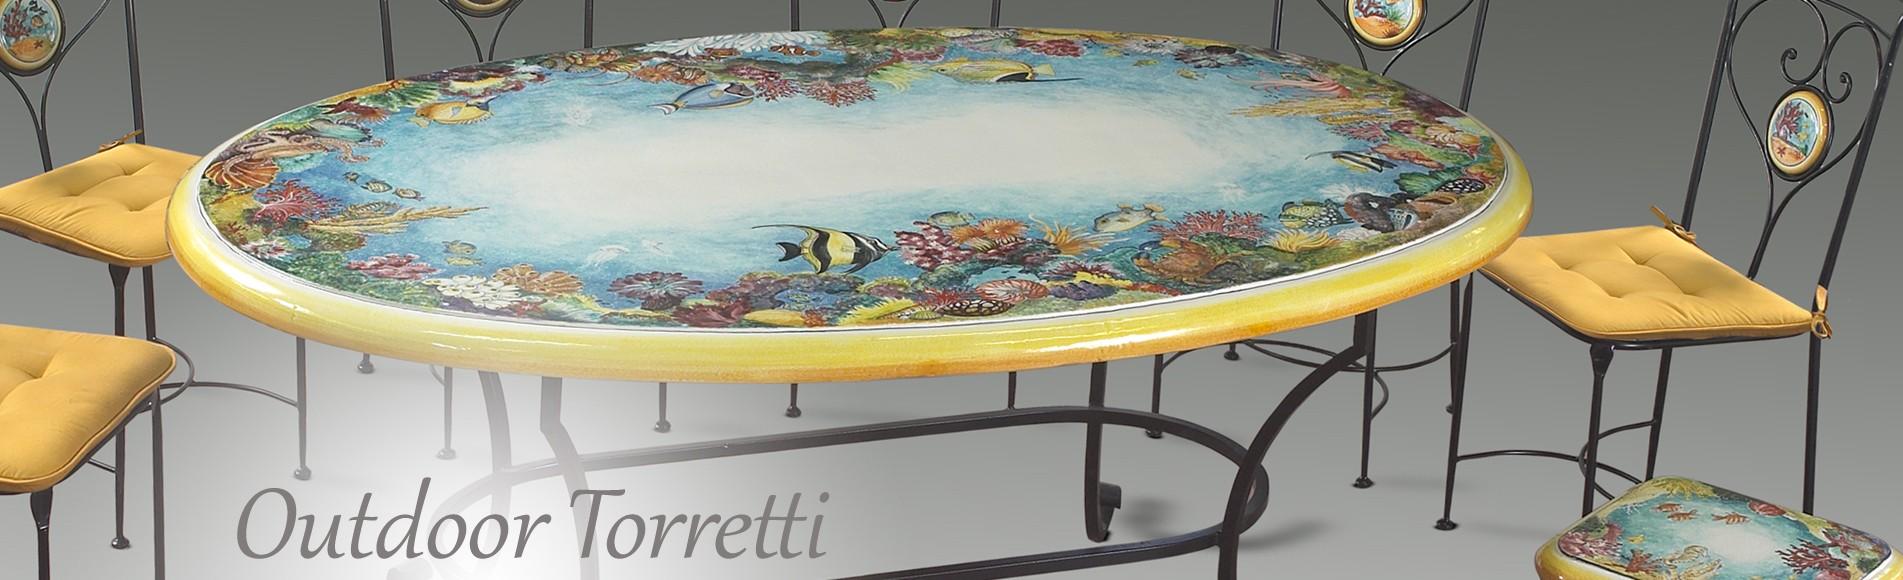 Tavoli Da Giardino Ceramica Caltagirone.Deruta Megastore Ceramiche Torretti Ceramics Deruta